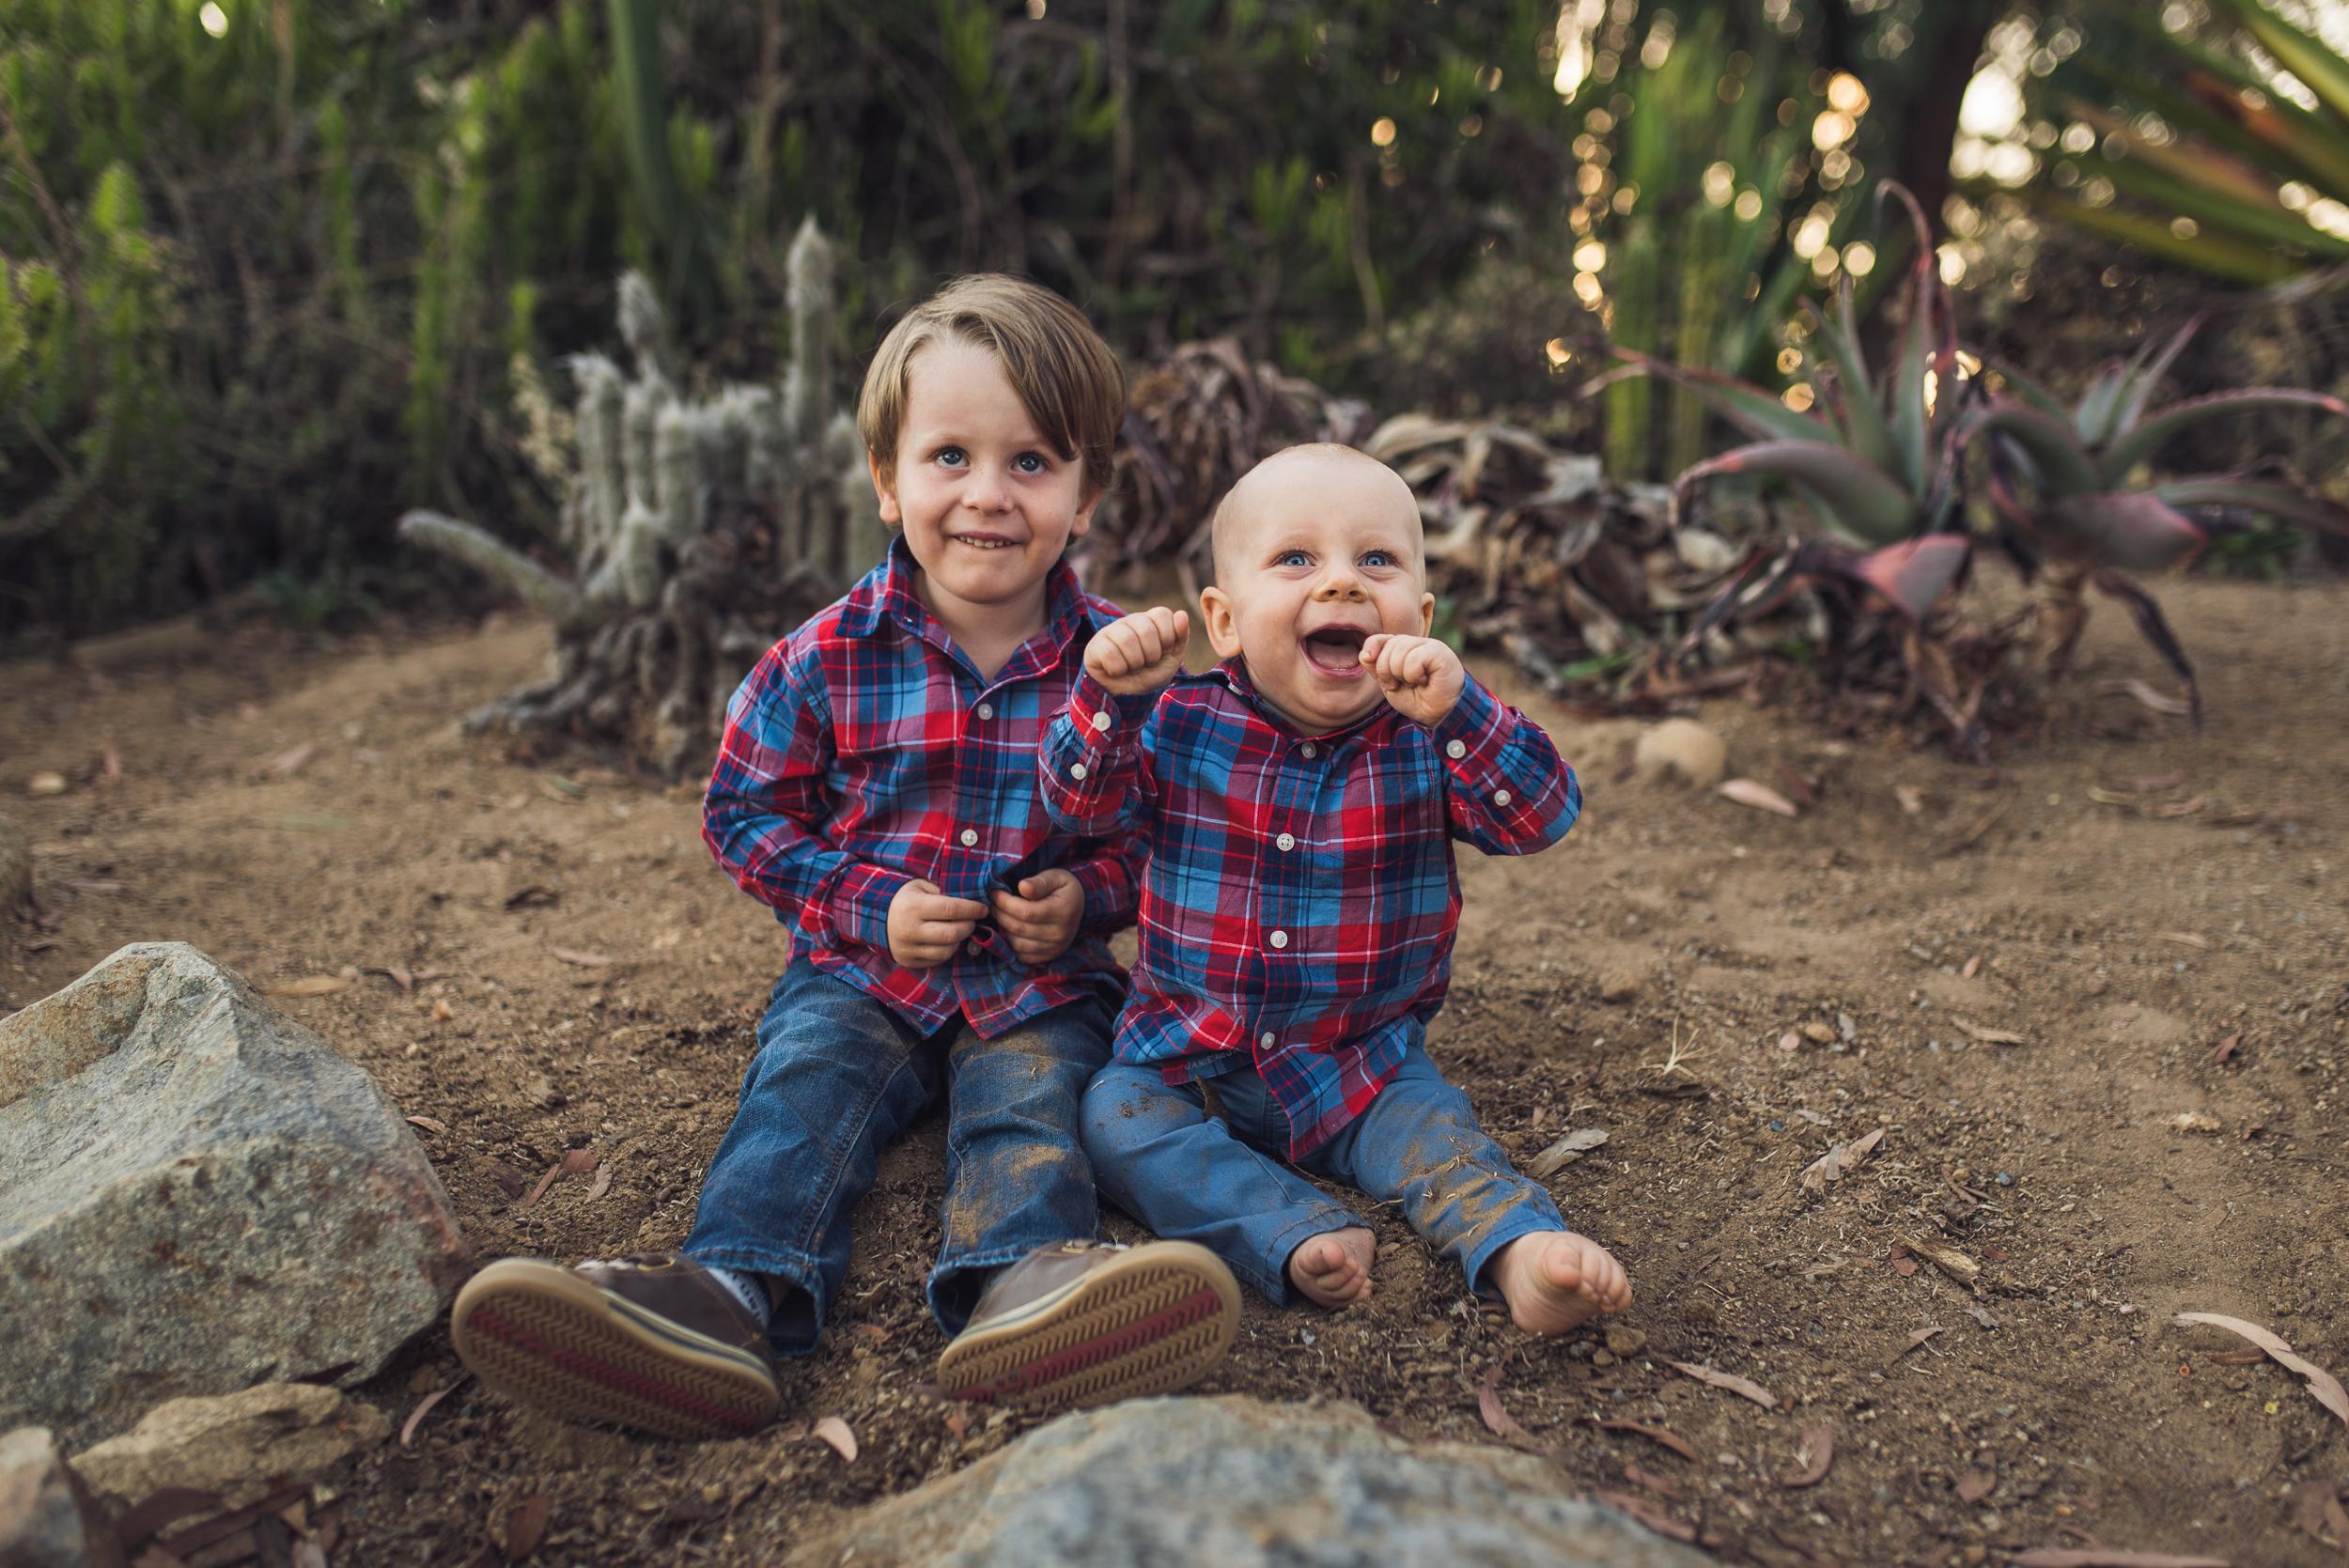 2018-San-Diego-Family-Lifestyle-Newborn-Travel-Vacation-Photographer-Kelsey-Smith-Photography-Coronado-La-Jolla-Encinitas-Solana-Beach-Del-Mar-176.jpg